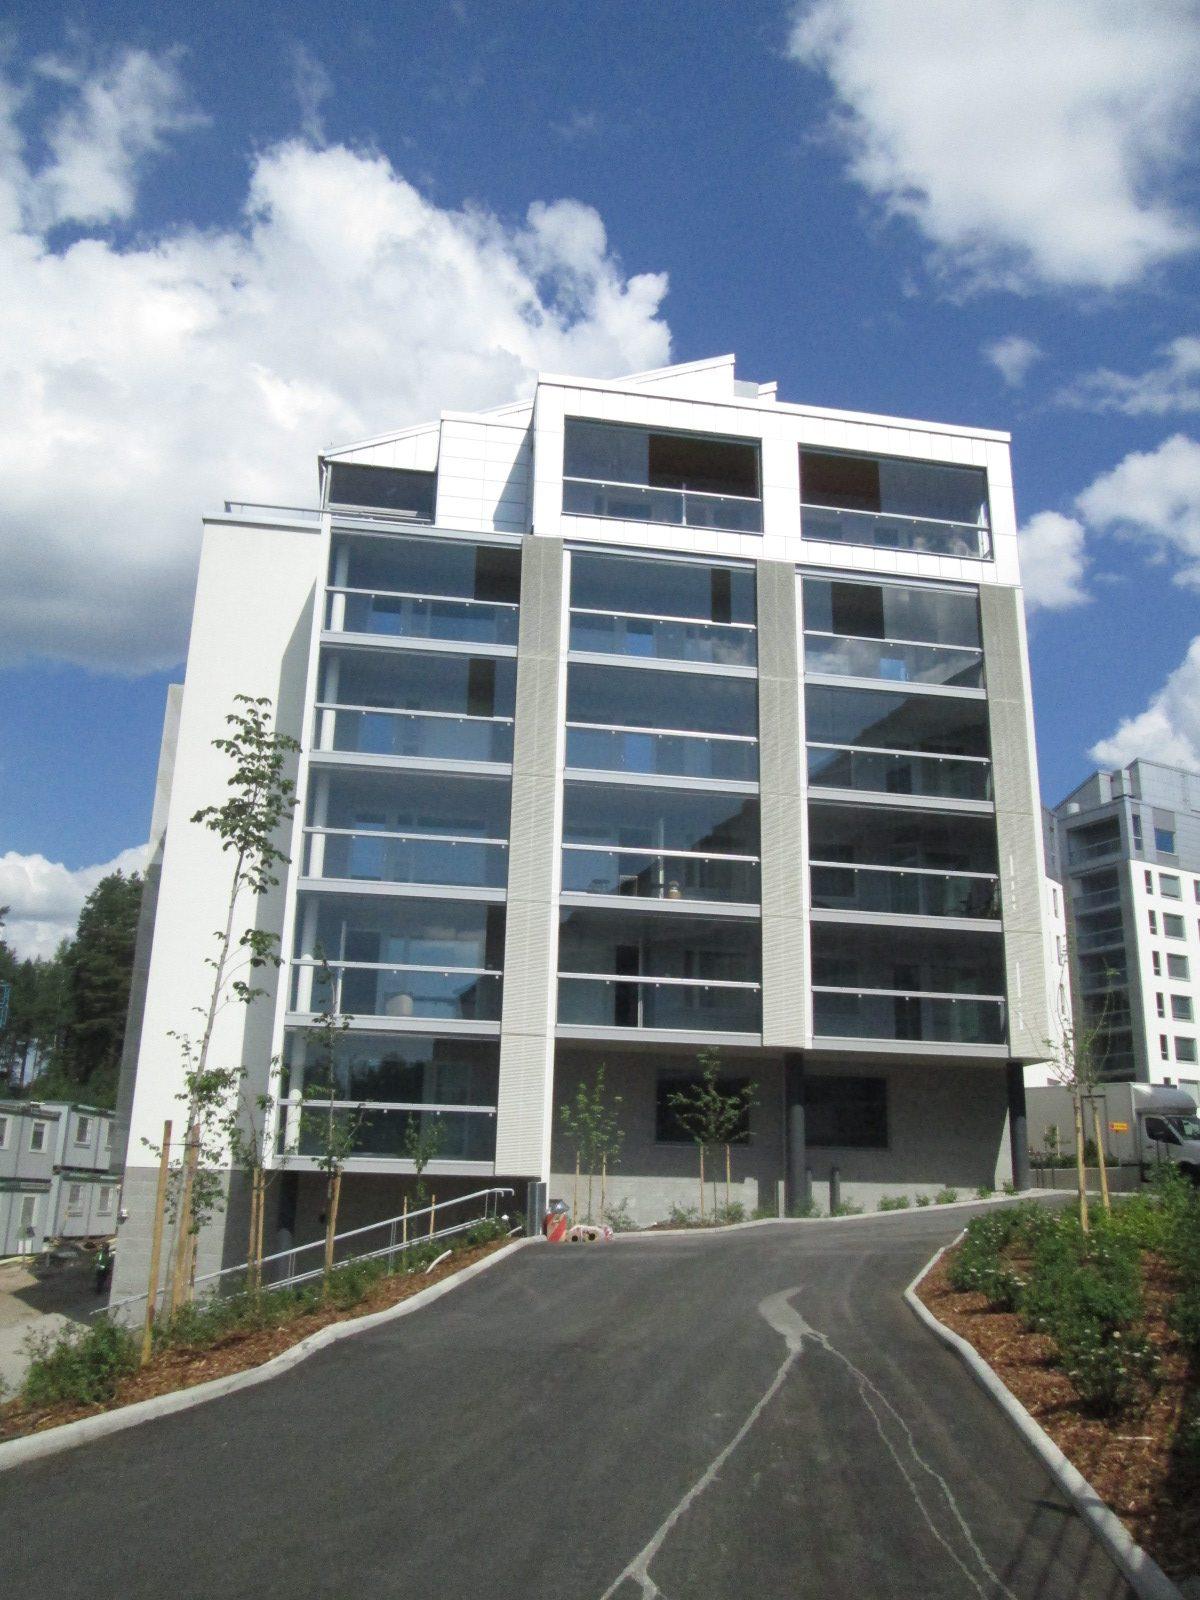 28,5 m² Ylismäentie 12 H, Olari, Espoo 1h, avok., kph  181 994 €